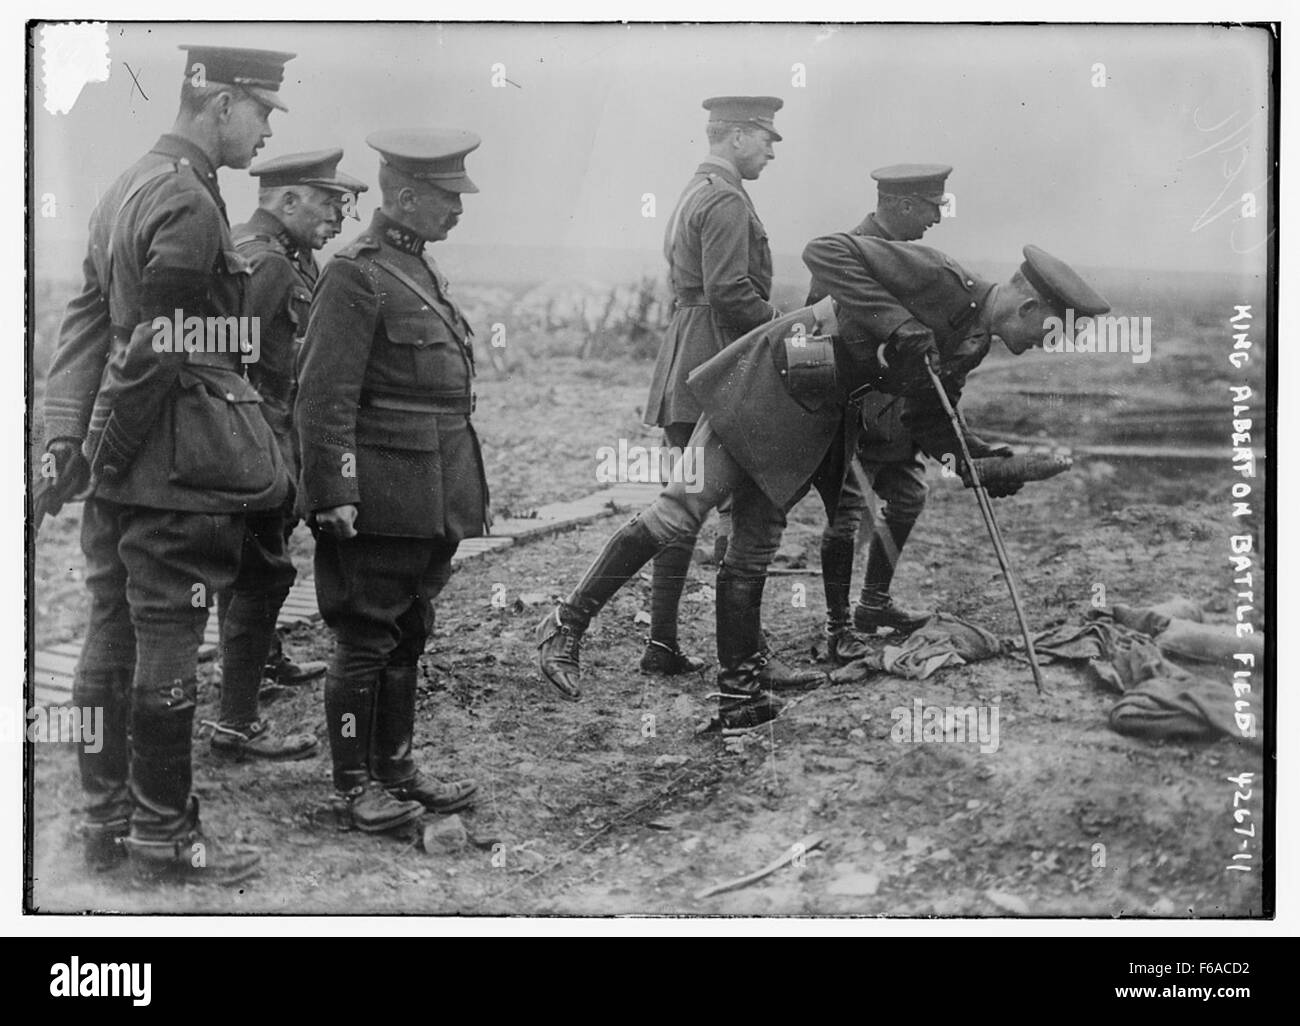 King Albert on Battle Field - Stock Image